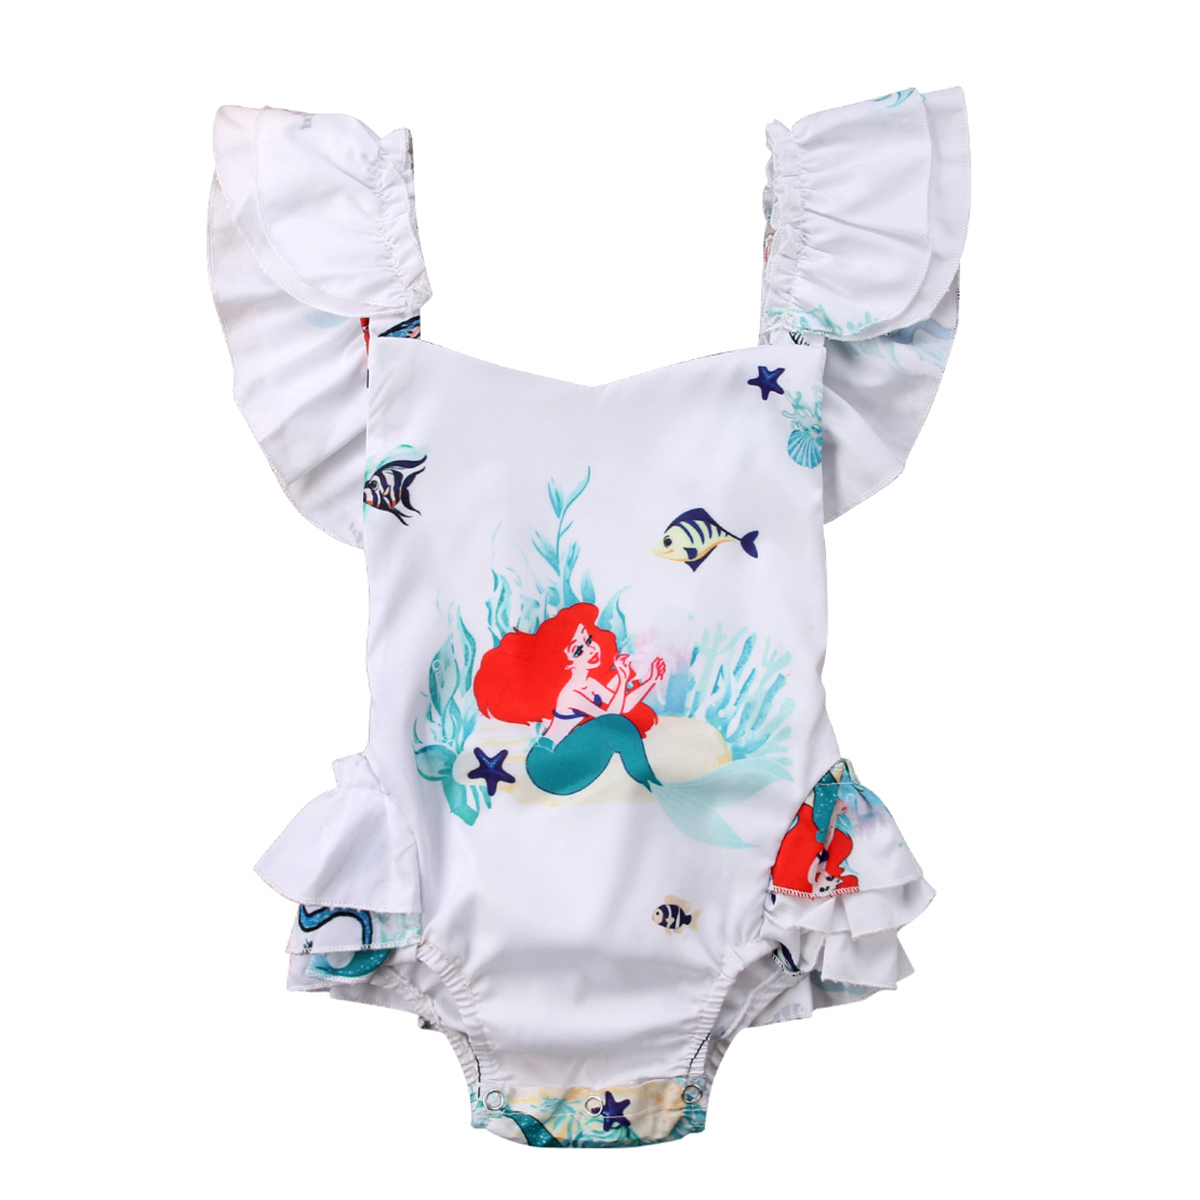 Kids Newborn Baby Girl Mermaid Romper Baby Girls Summer Backless Jumpsuit Cotton Baby Clothing